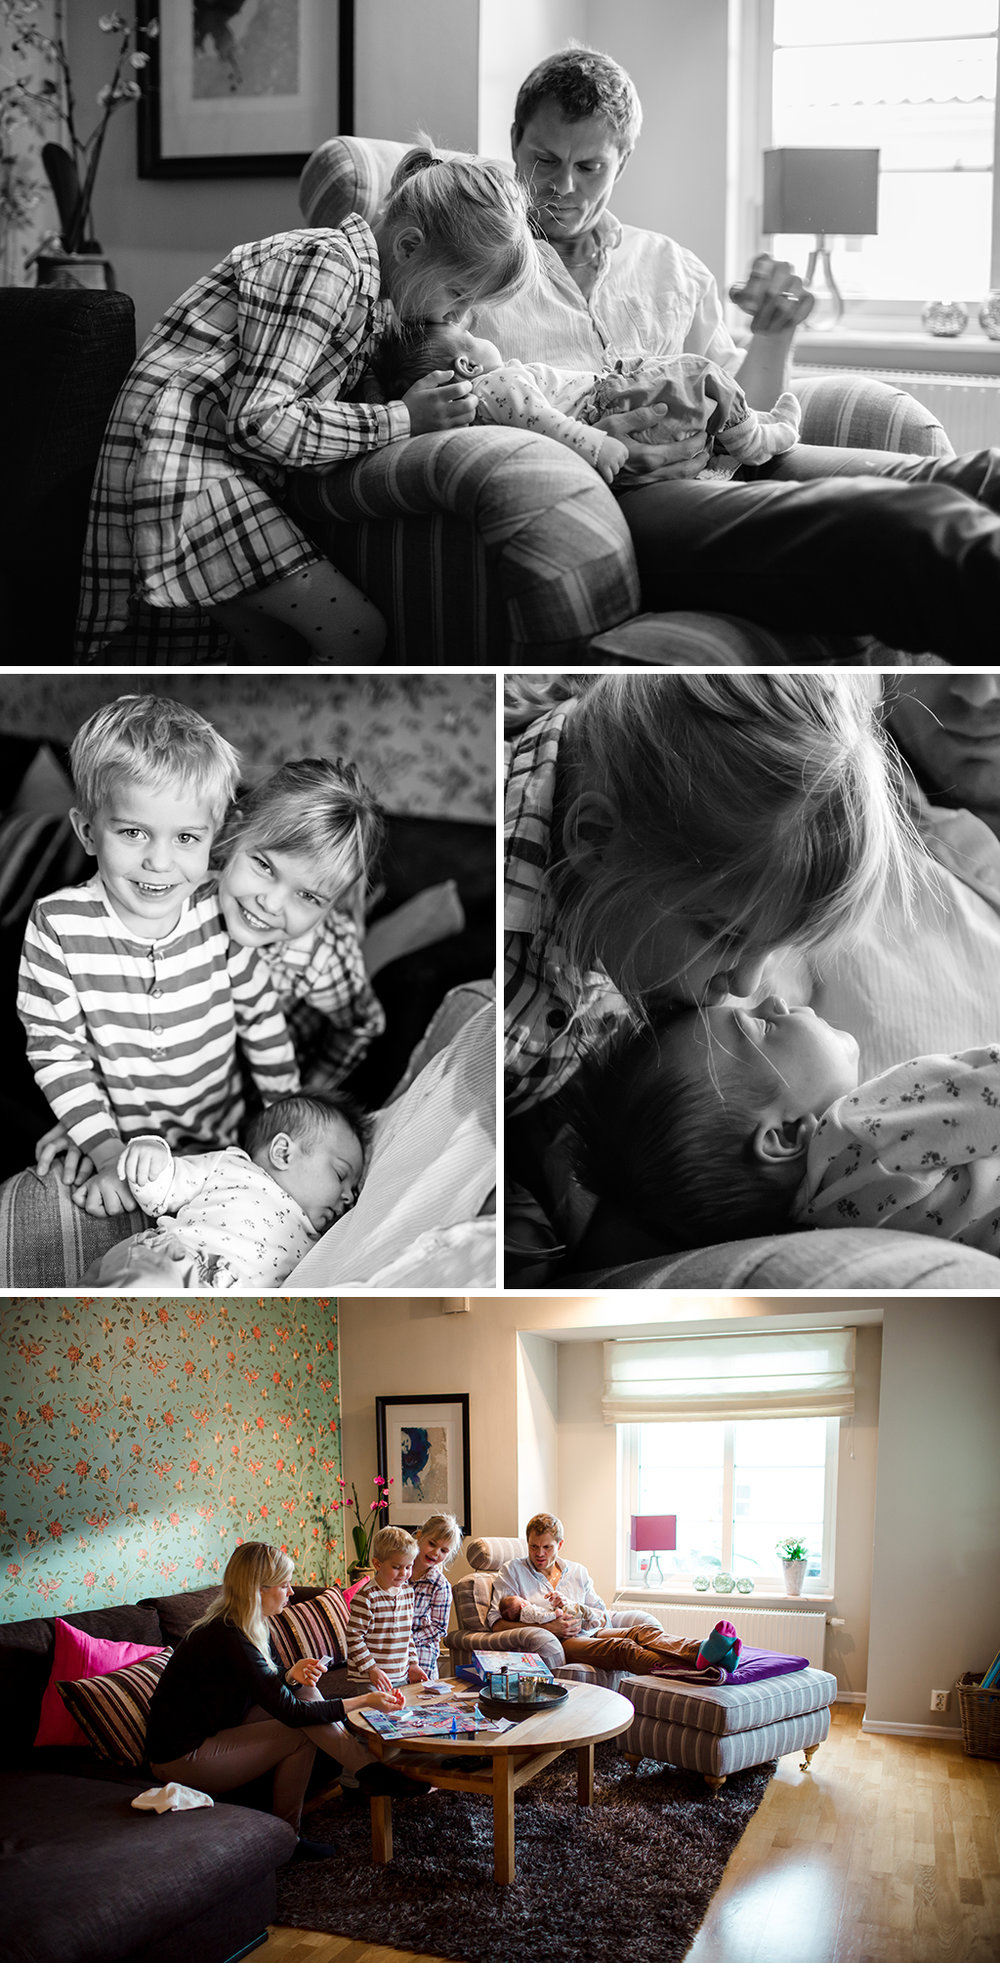 Nyfoddfotografering-lifestyle-familjefotografering-Stockholm-2.jpg